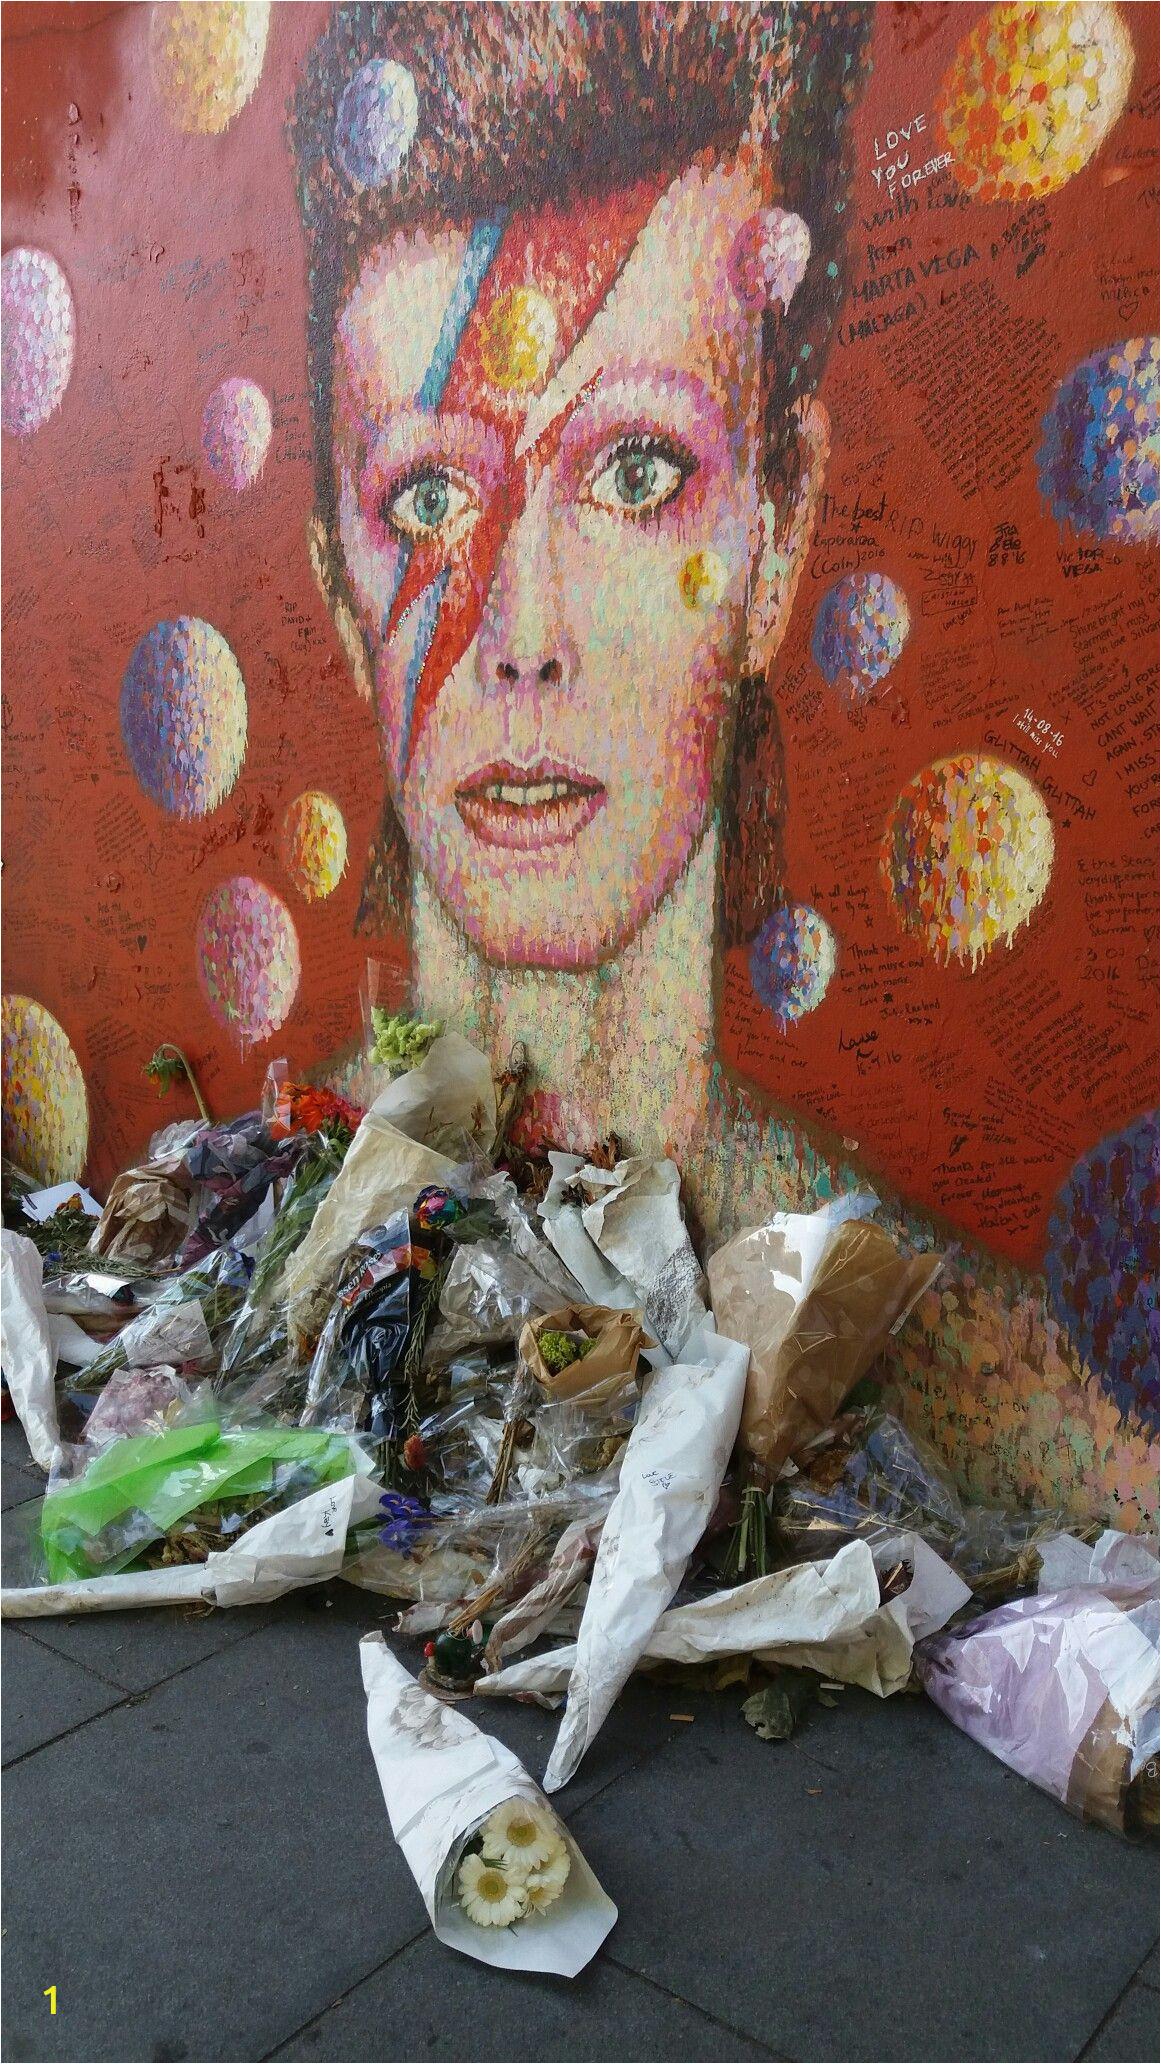 David Bowie Wall Mural Brixton Pin by Pääkki On David Bowie Memorial Wall In Brixton London